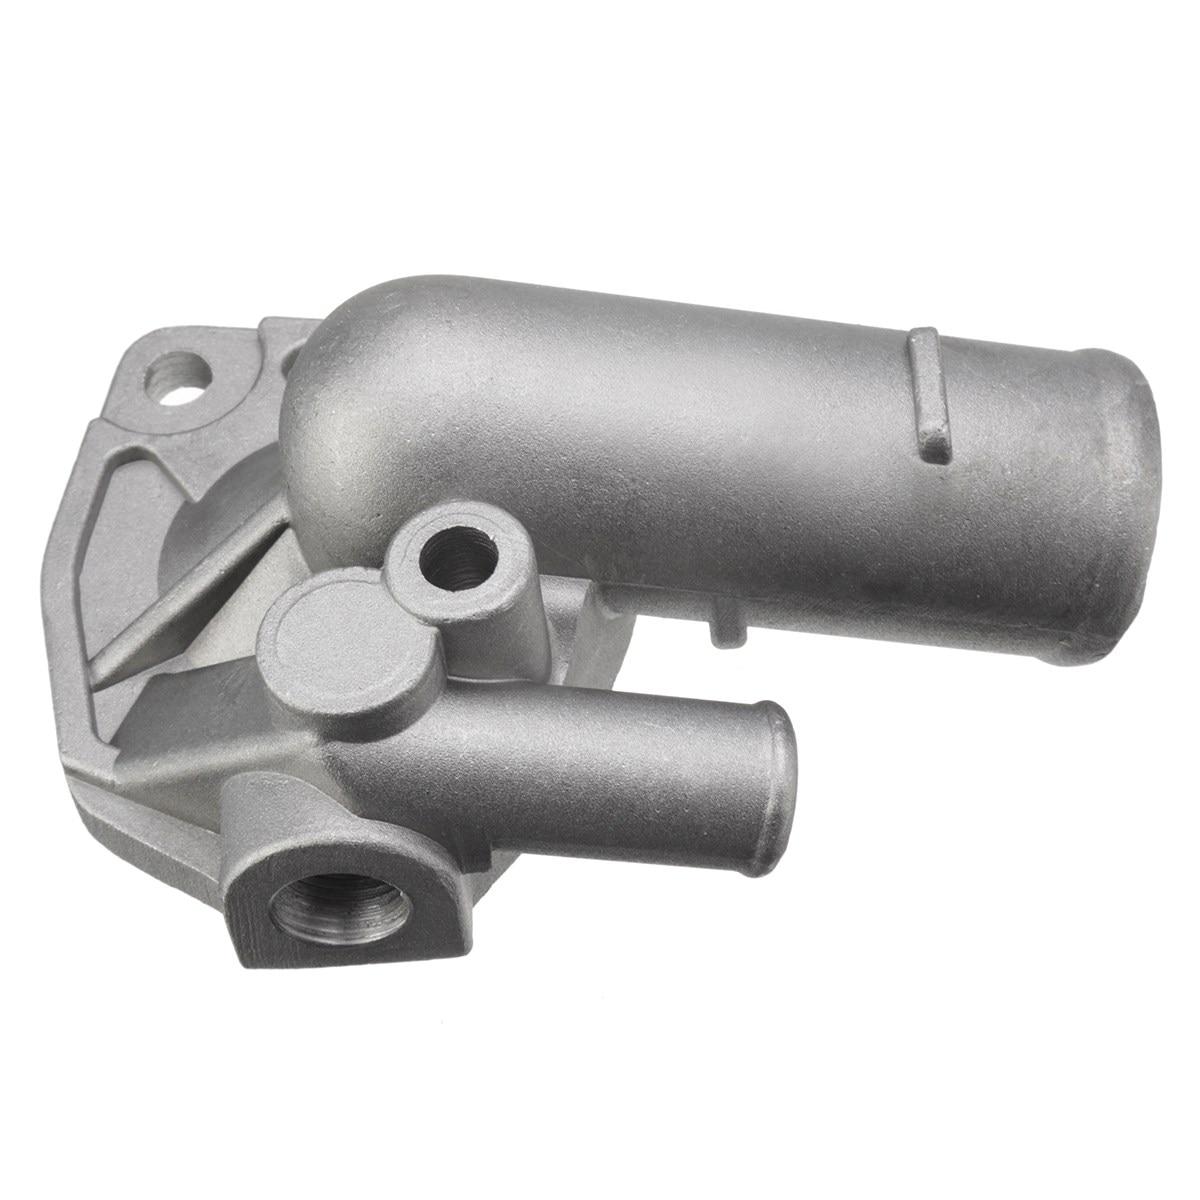 Двигатели для автомобиля Хладагент термостат с Корпус для Jeep/Wrangler CHEROKEE COMANCHE TJ для Dodge Dakota #902-306 53006192 ...